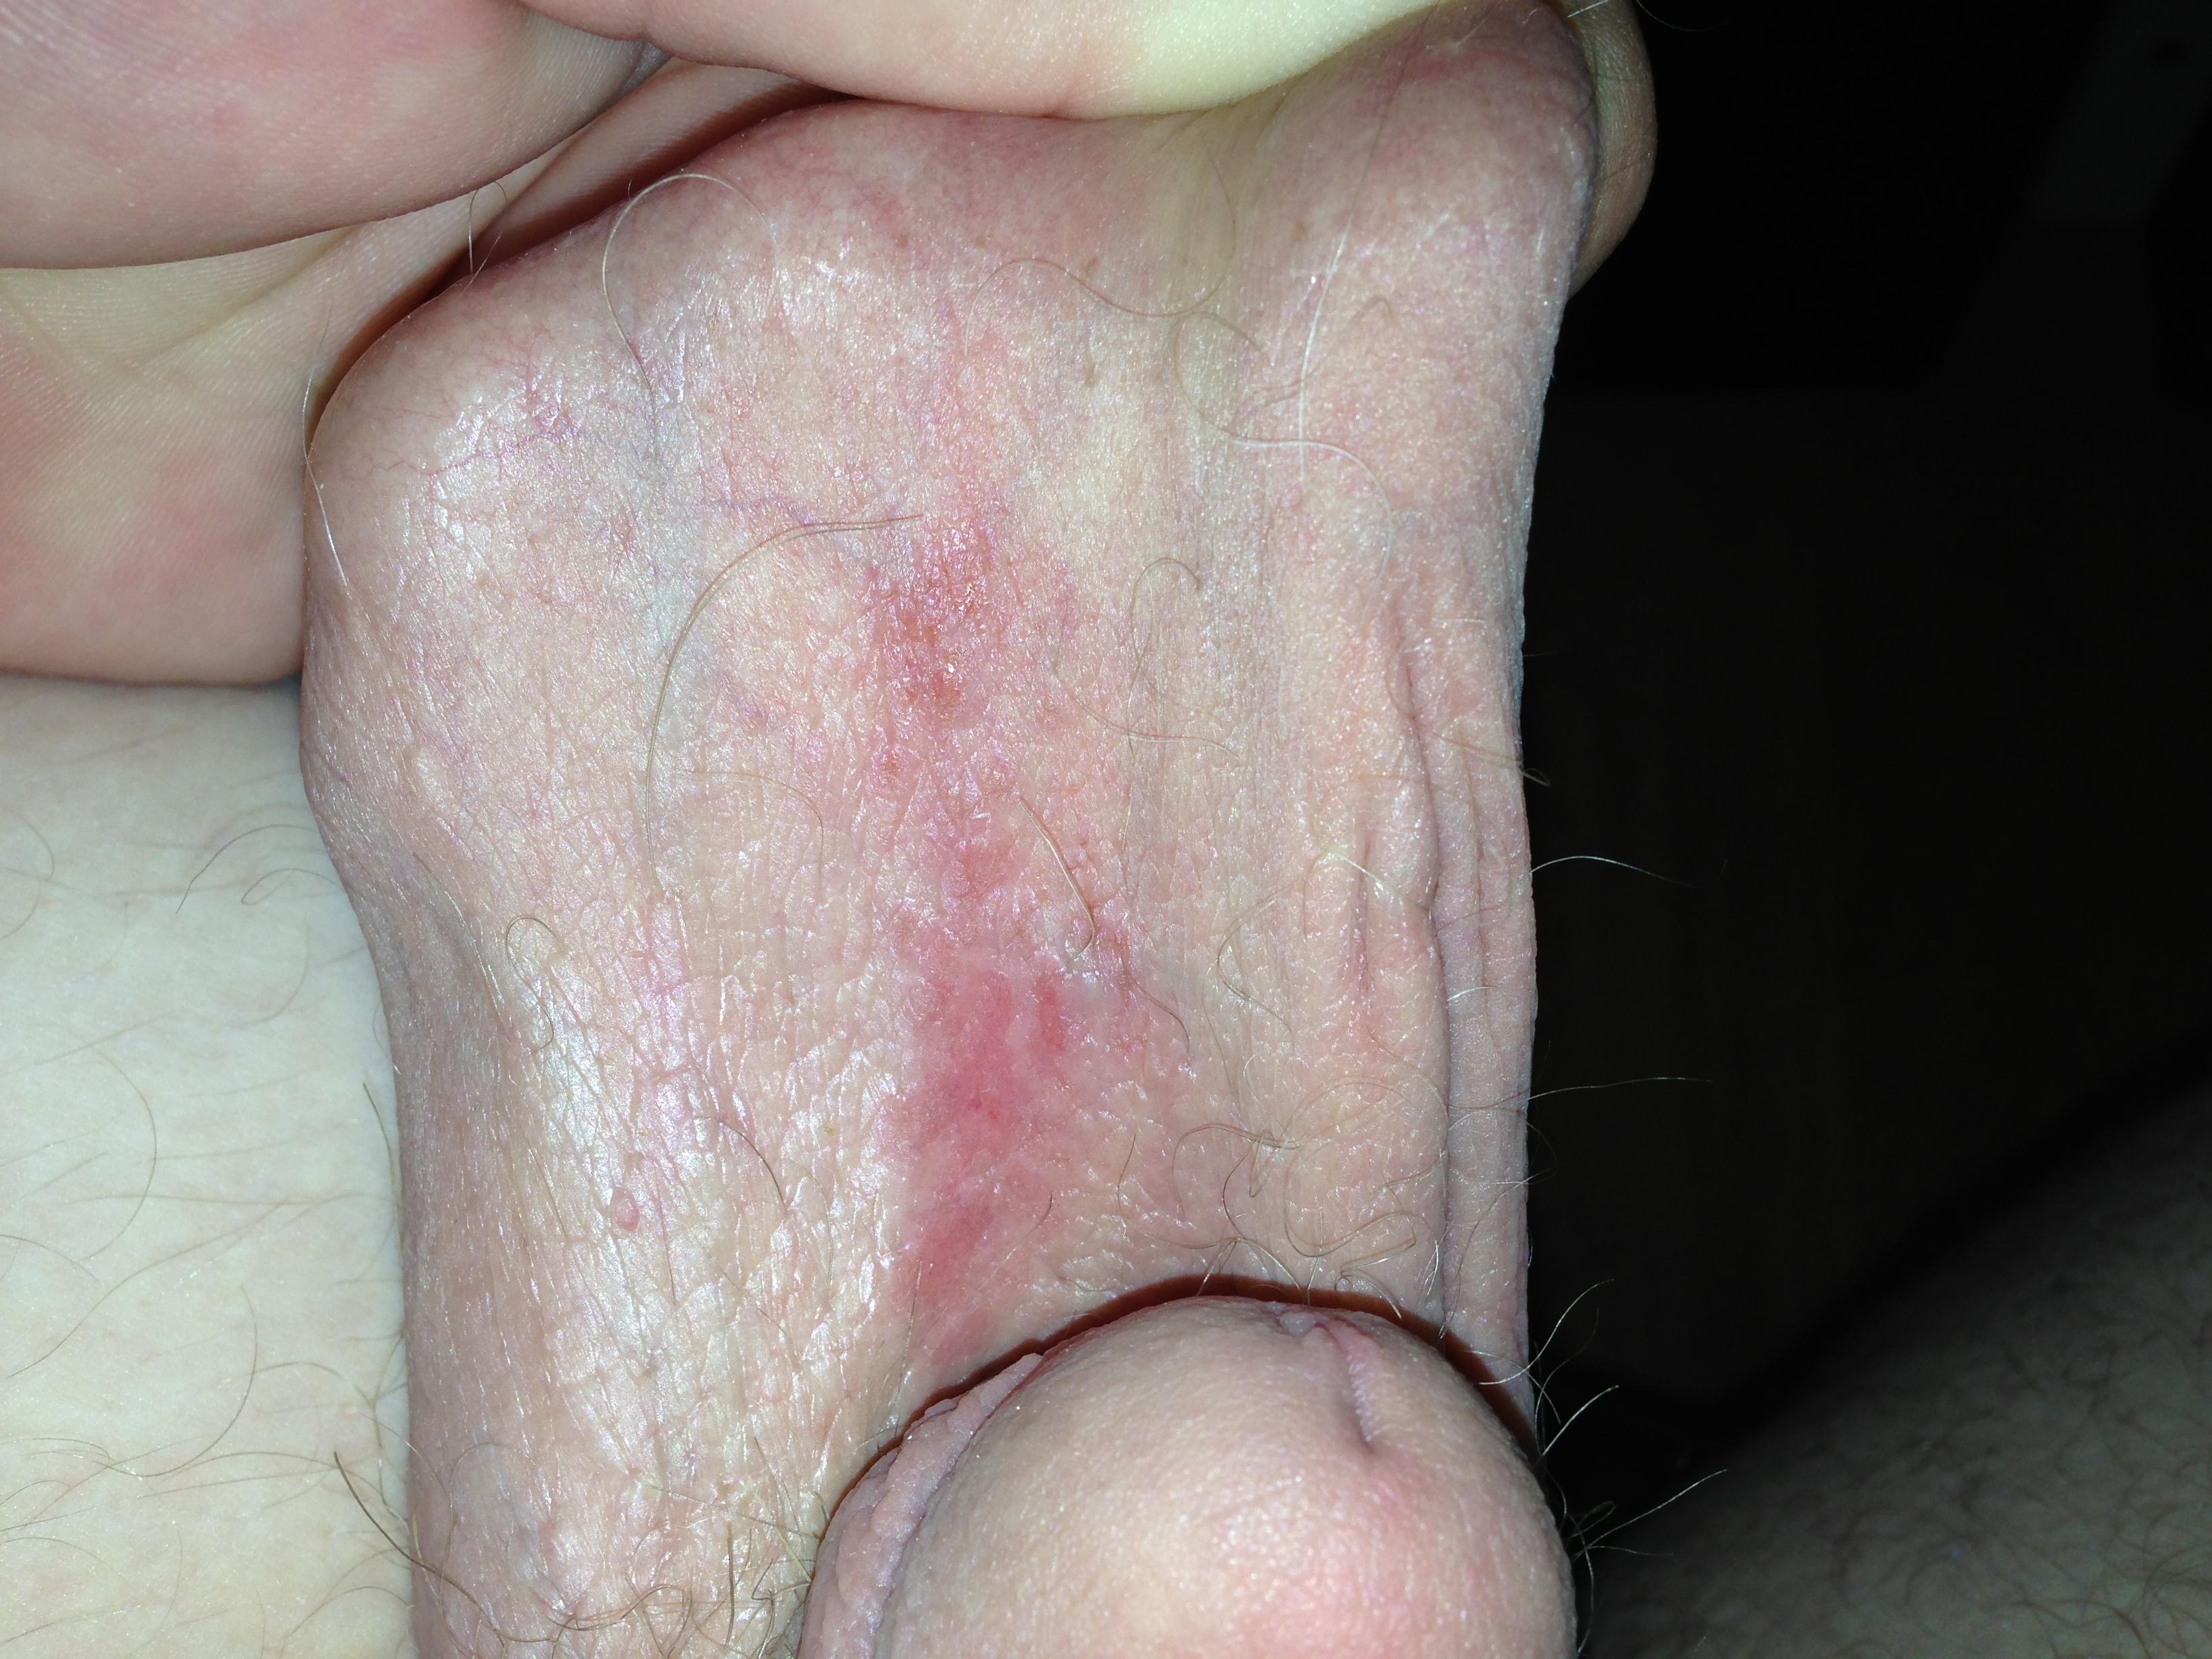 Itchy rash anus